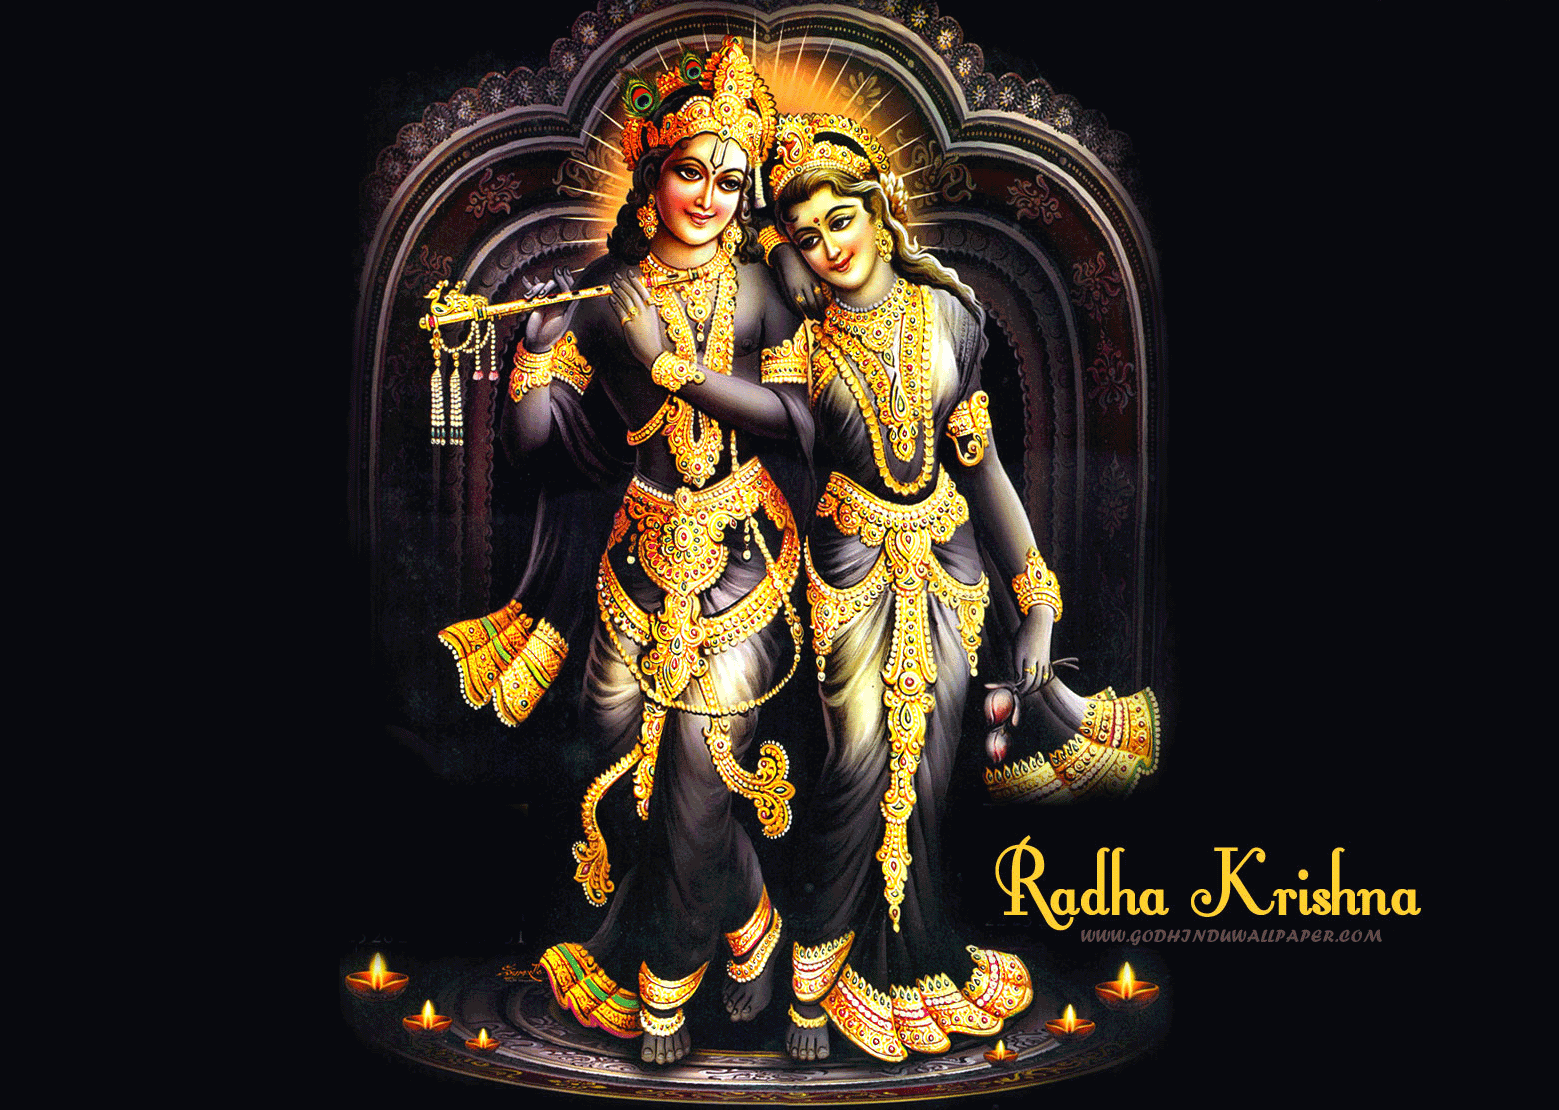 Hindu Gods Wallpaper For Desktop: God Hindu Images Wallpapers